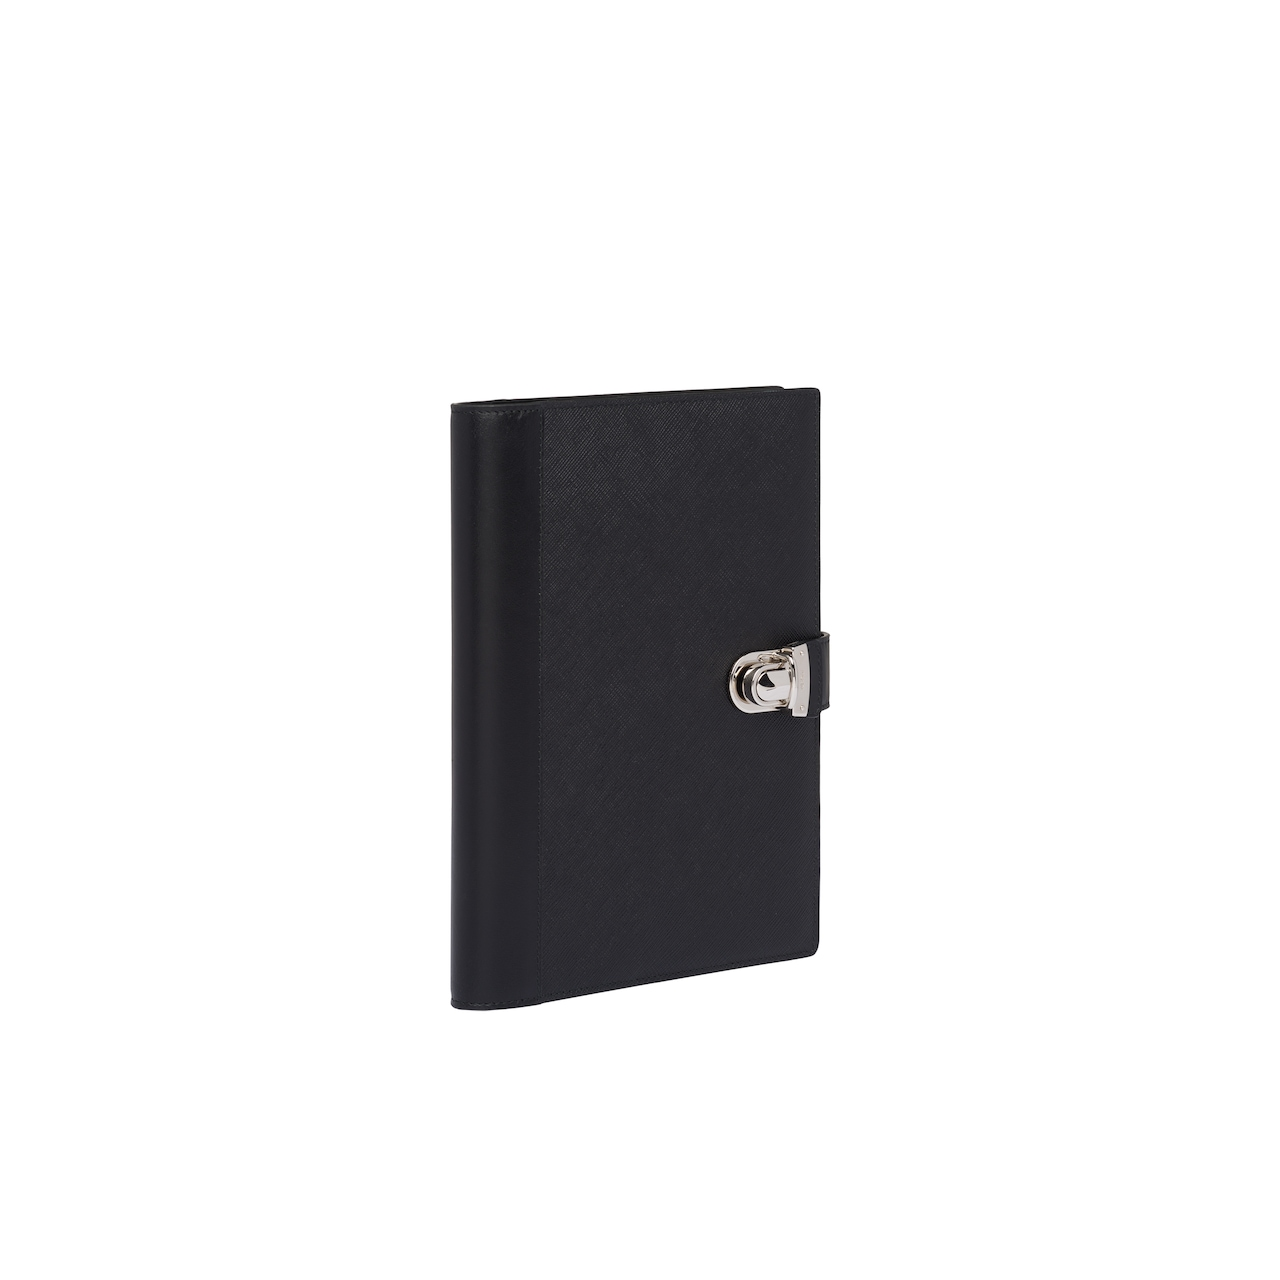 Prada Saffiano leather pocket diary 4